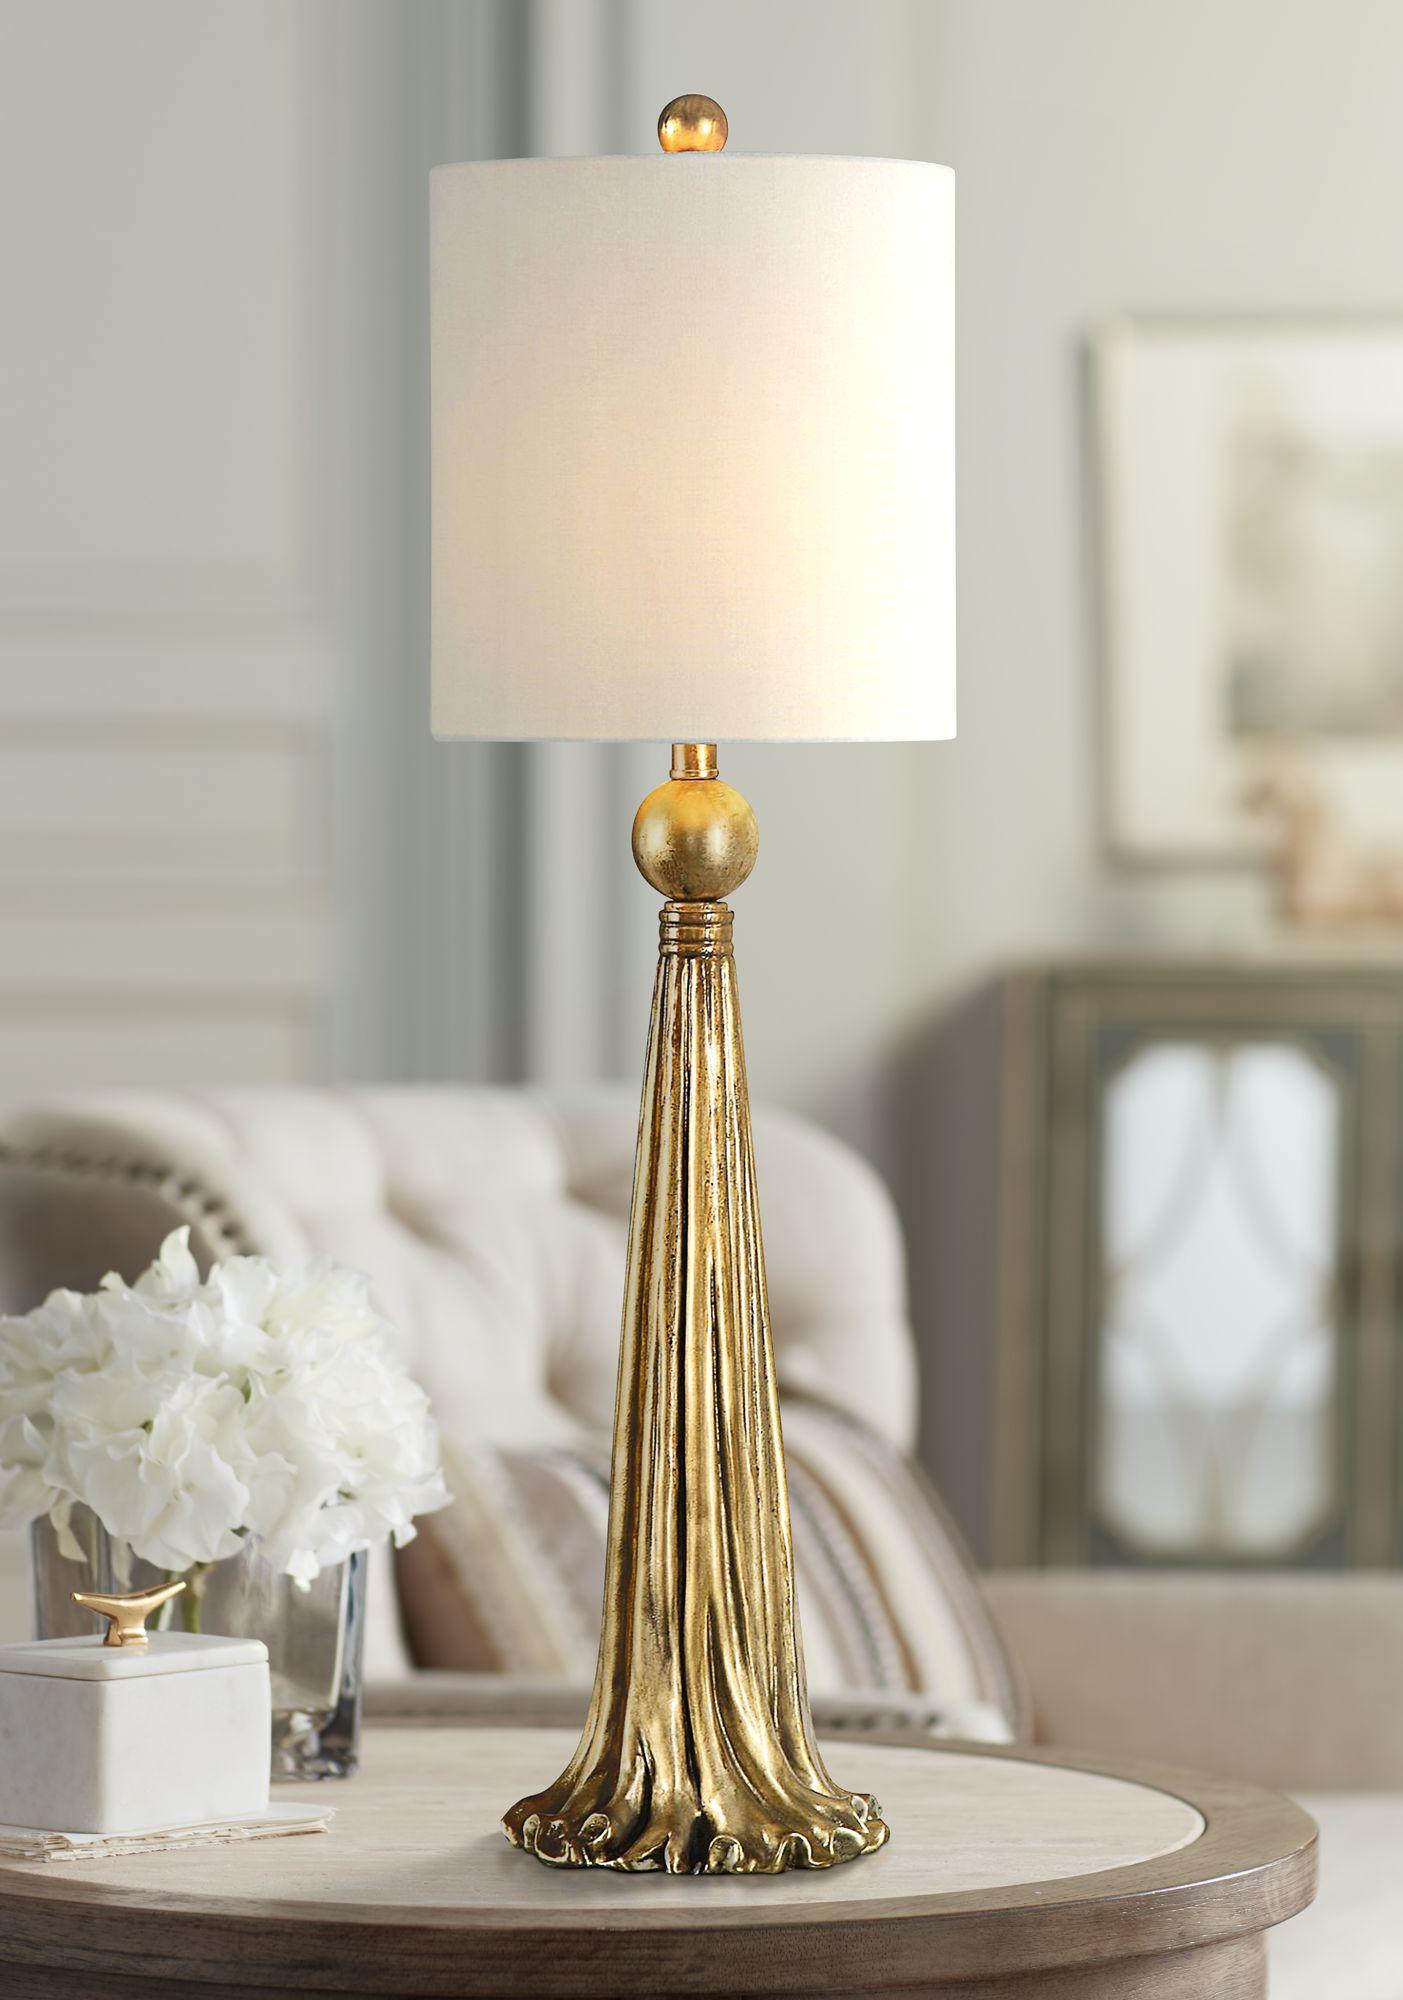 Buffet Lamps Extreme Paravani Antique Metallic Gold Buffet Table Lamp NXTKYWF